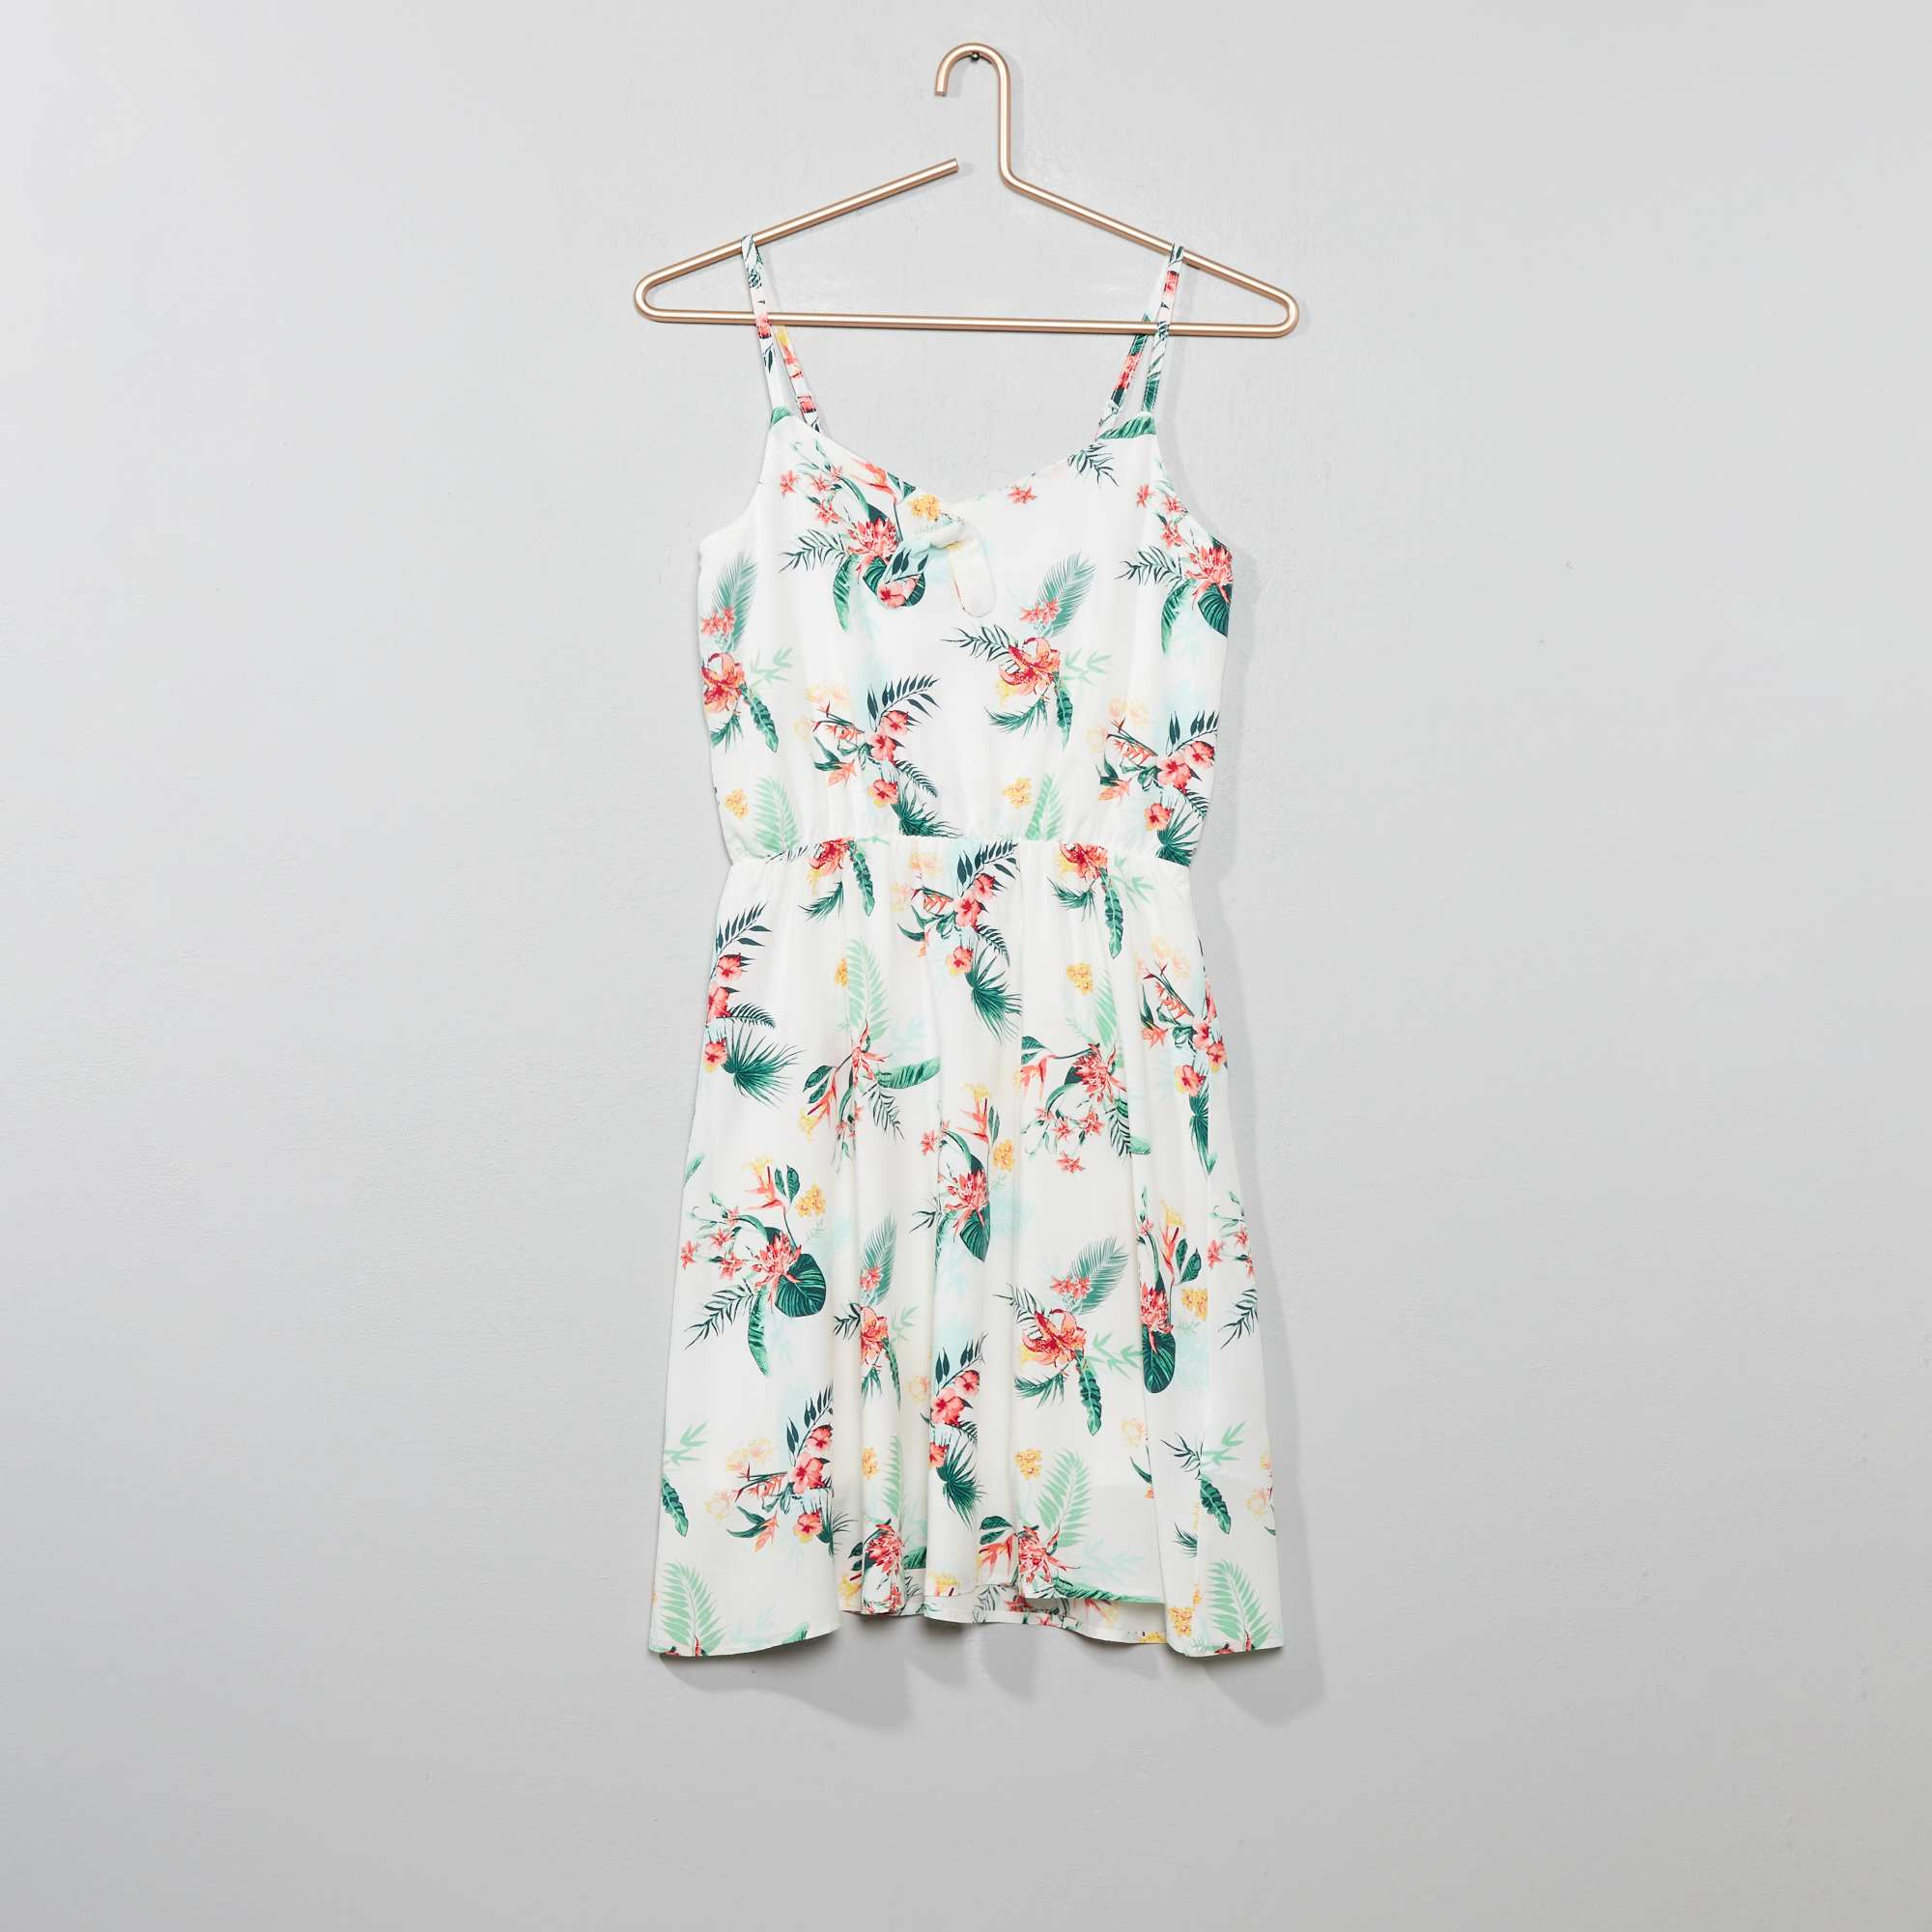 3ccb7556a Vestido soltinho estampado Branco Menina 10-18 anos. Loading zoom